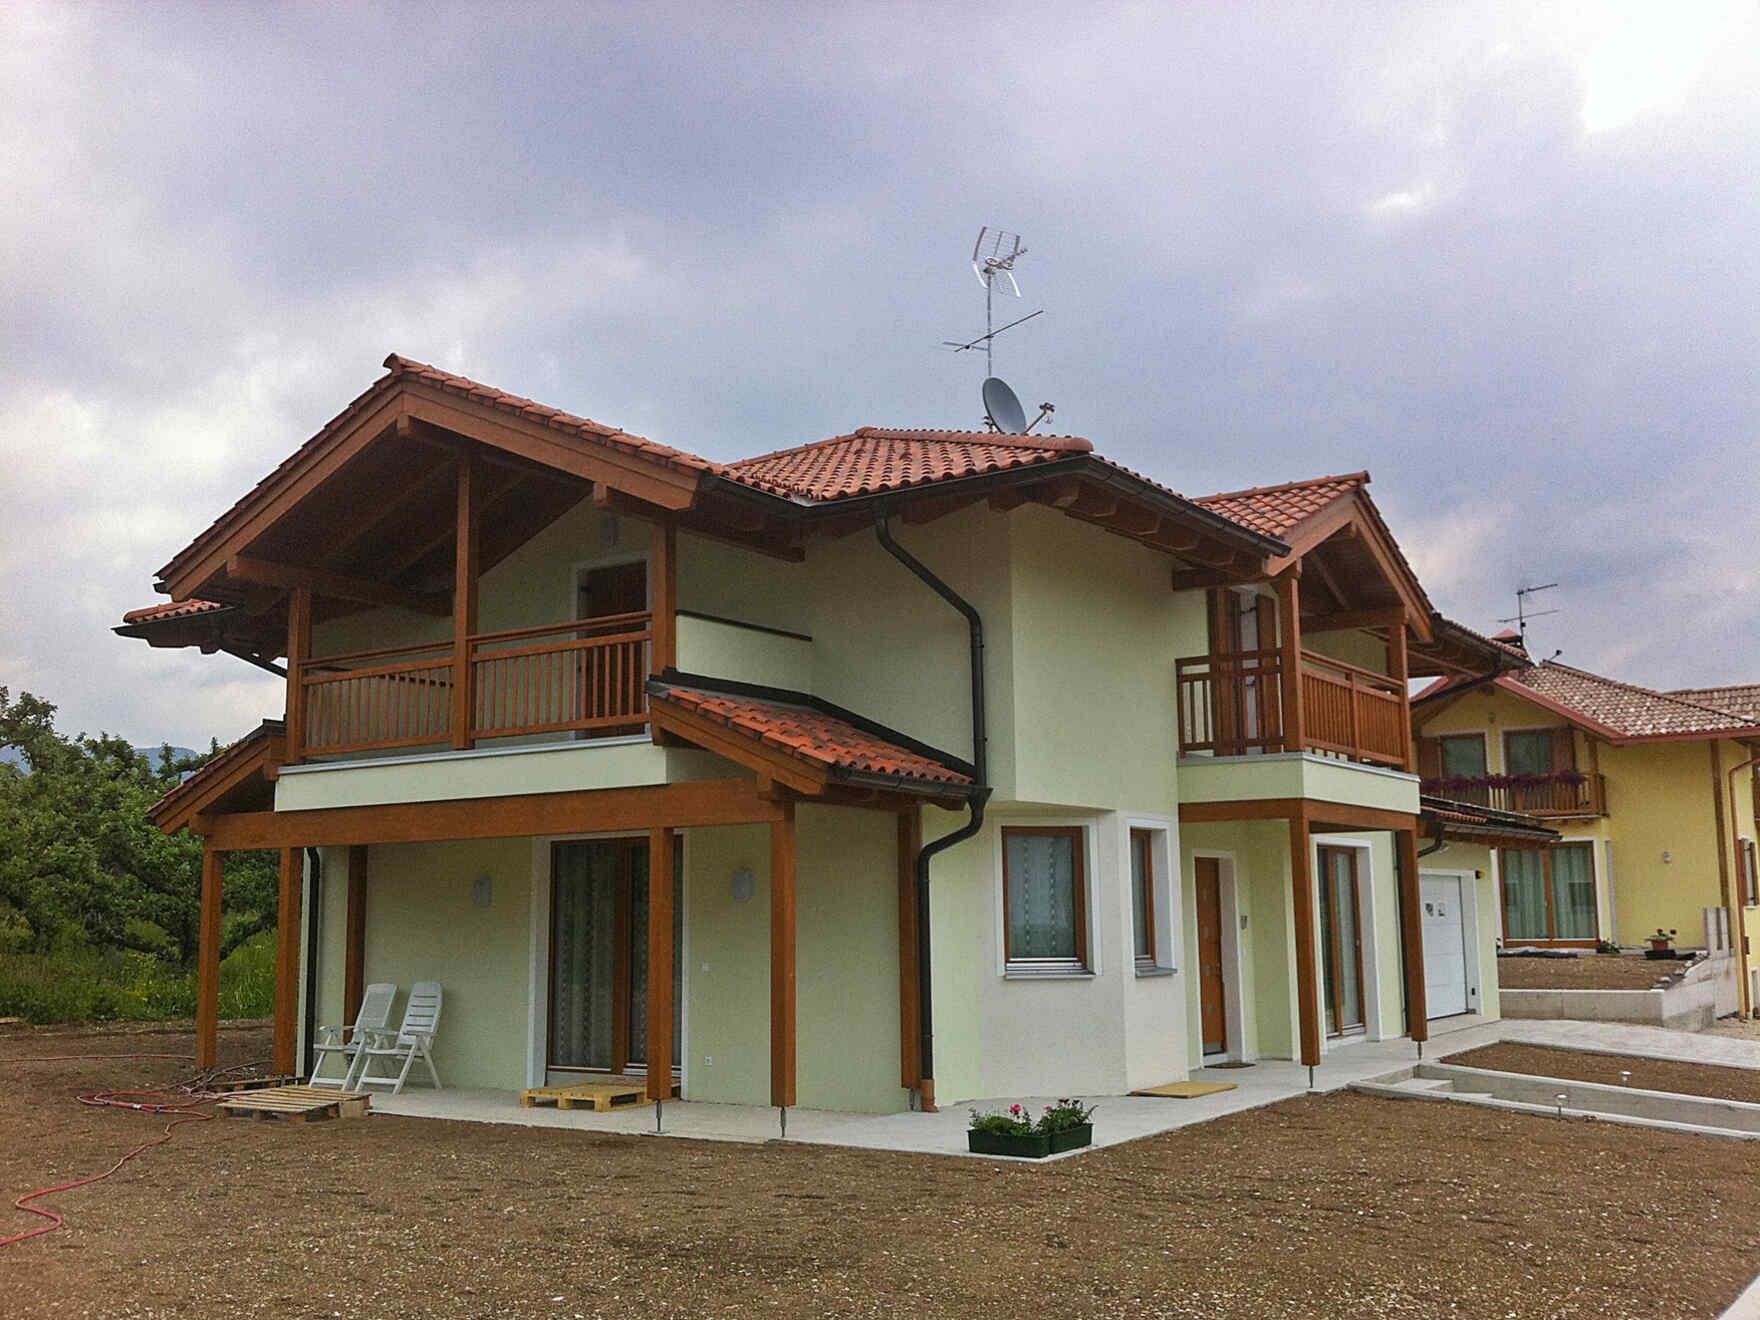 Maison préfabriquée famiglia Fellin